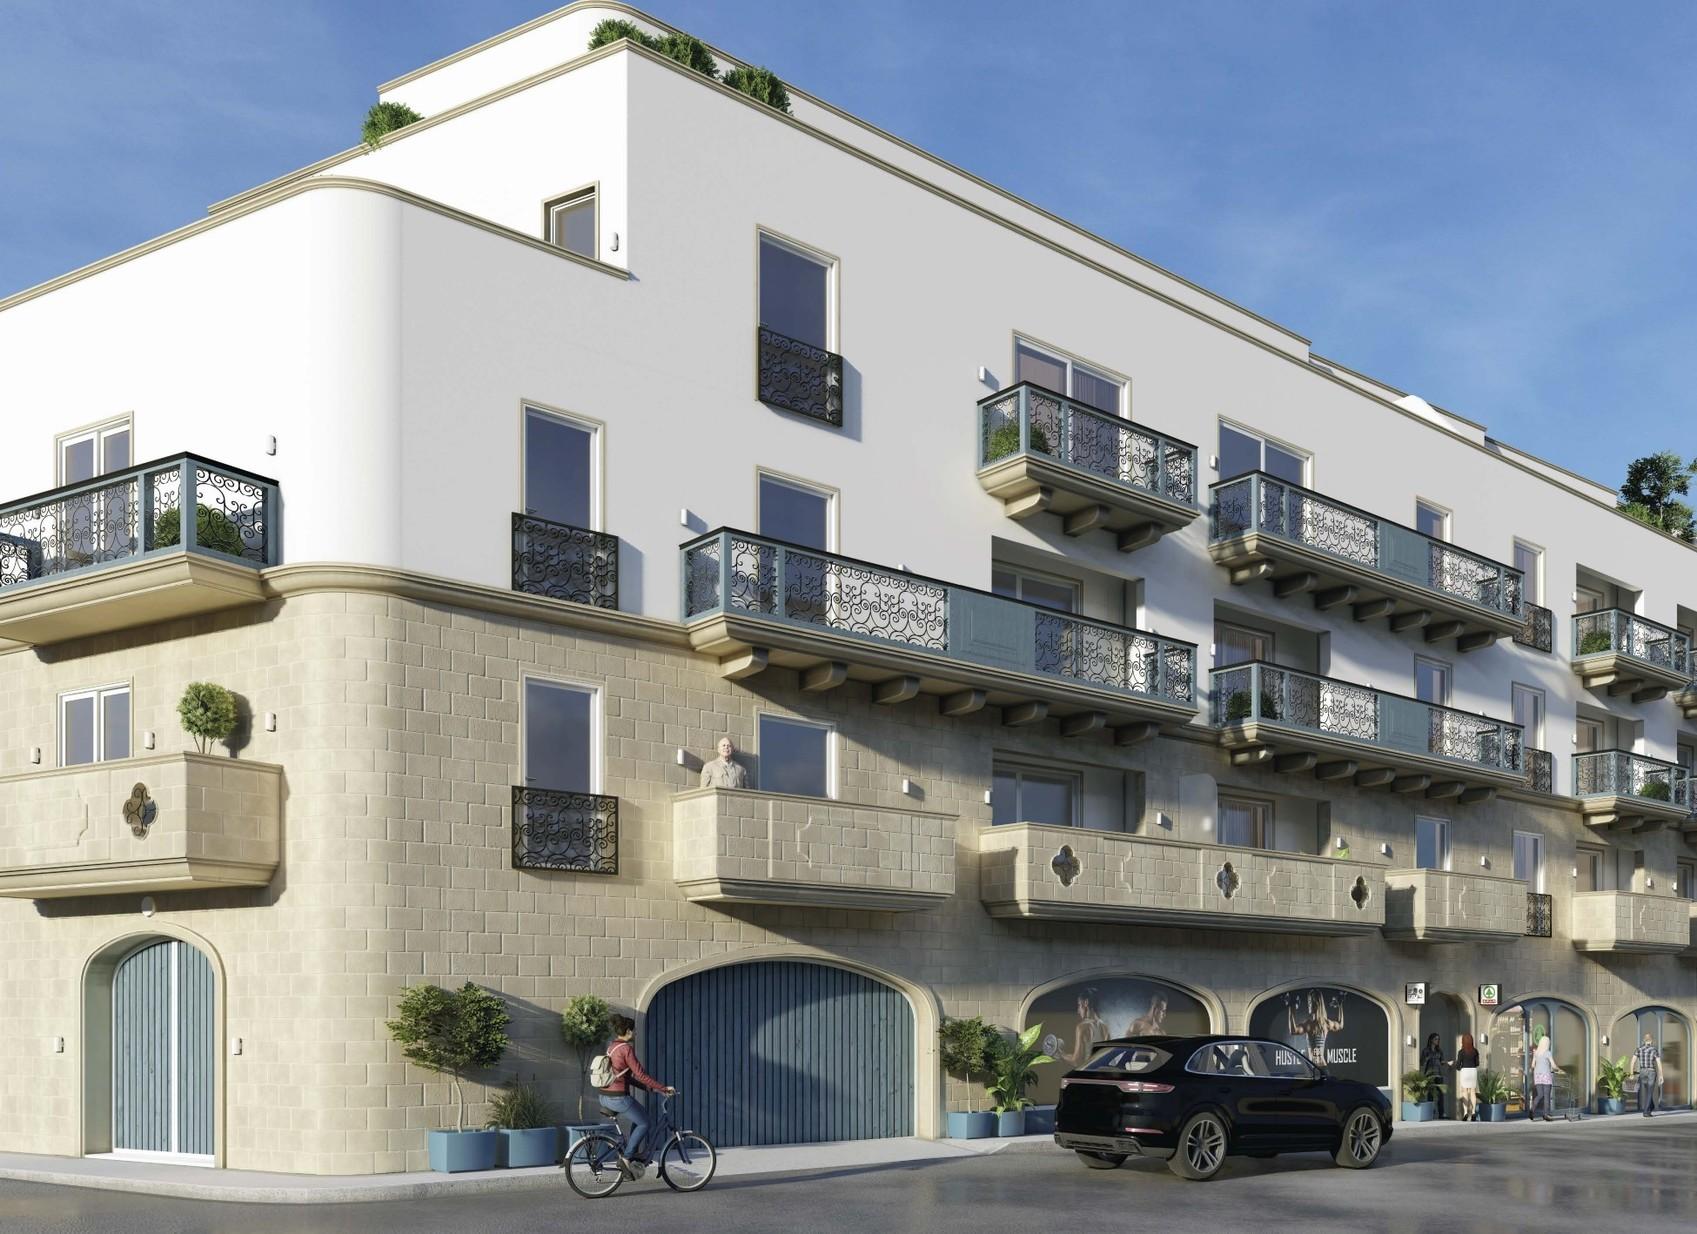 3 bed Apartment For Sale in Balzan, Balzan - thumb 2